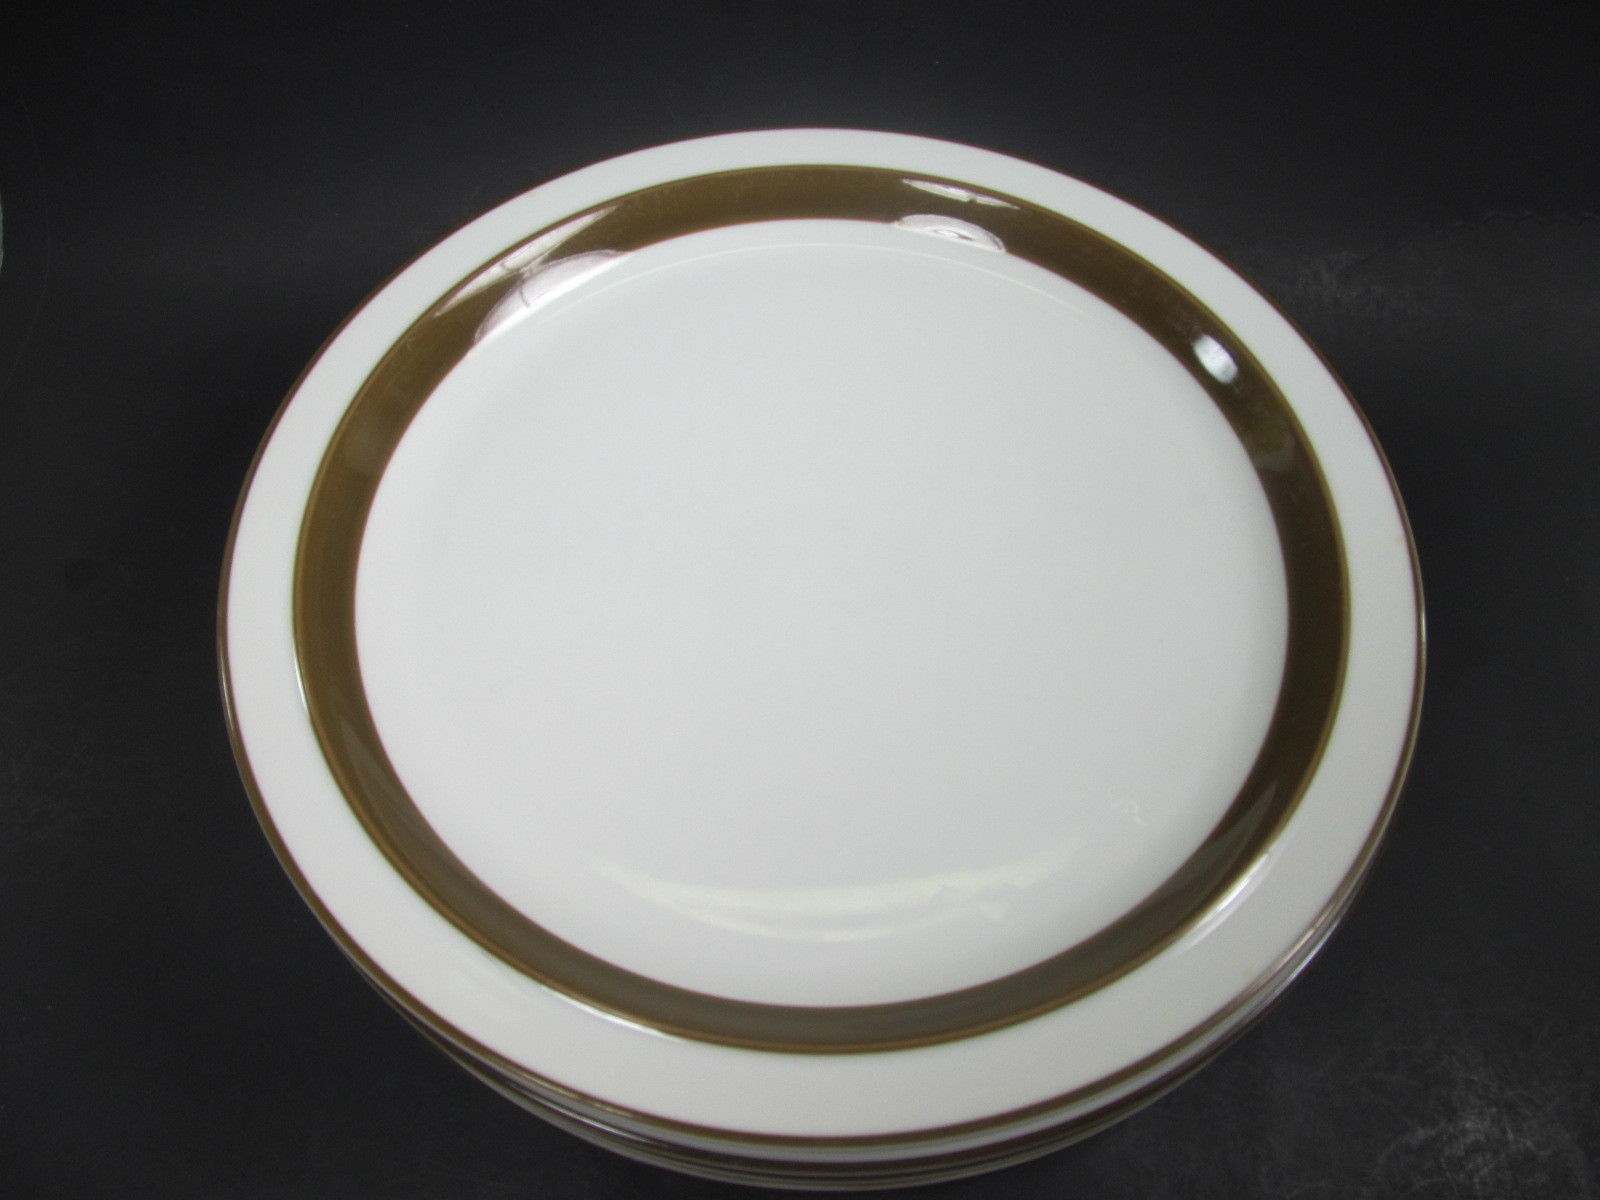 Mikasa Metro White Brown Rim Dinner Plates L4825 & Mikasa Metro White Brown Rim Dinner Plates and 50 similar items